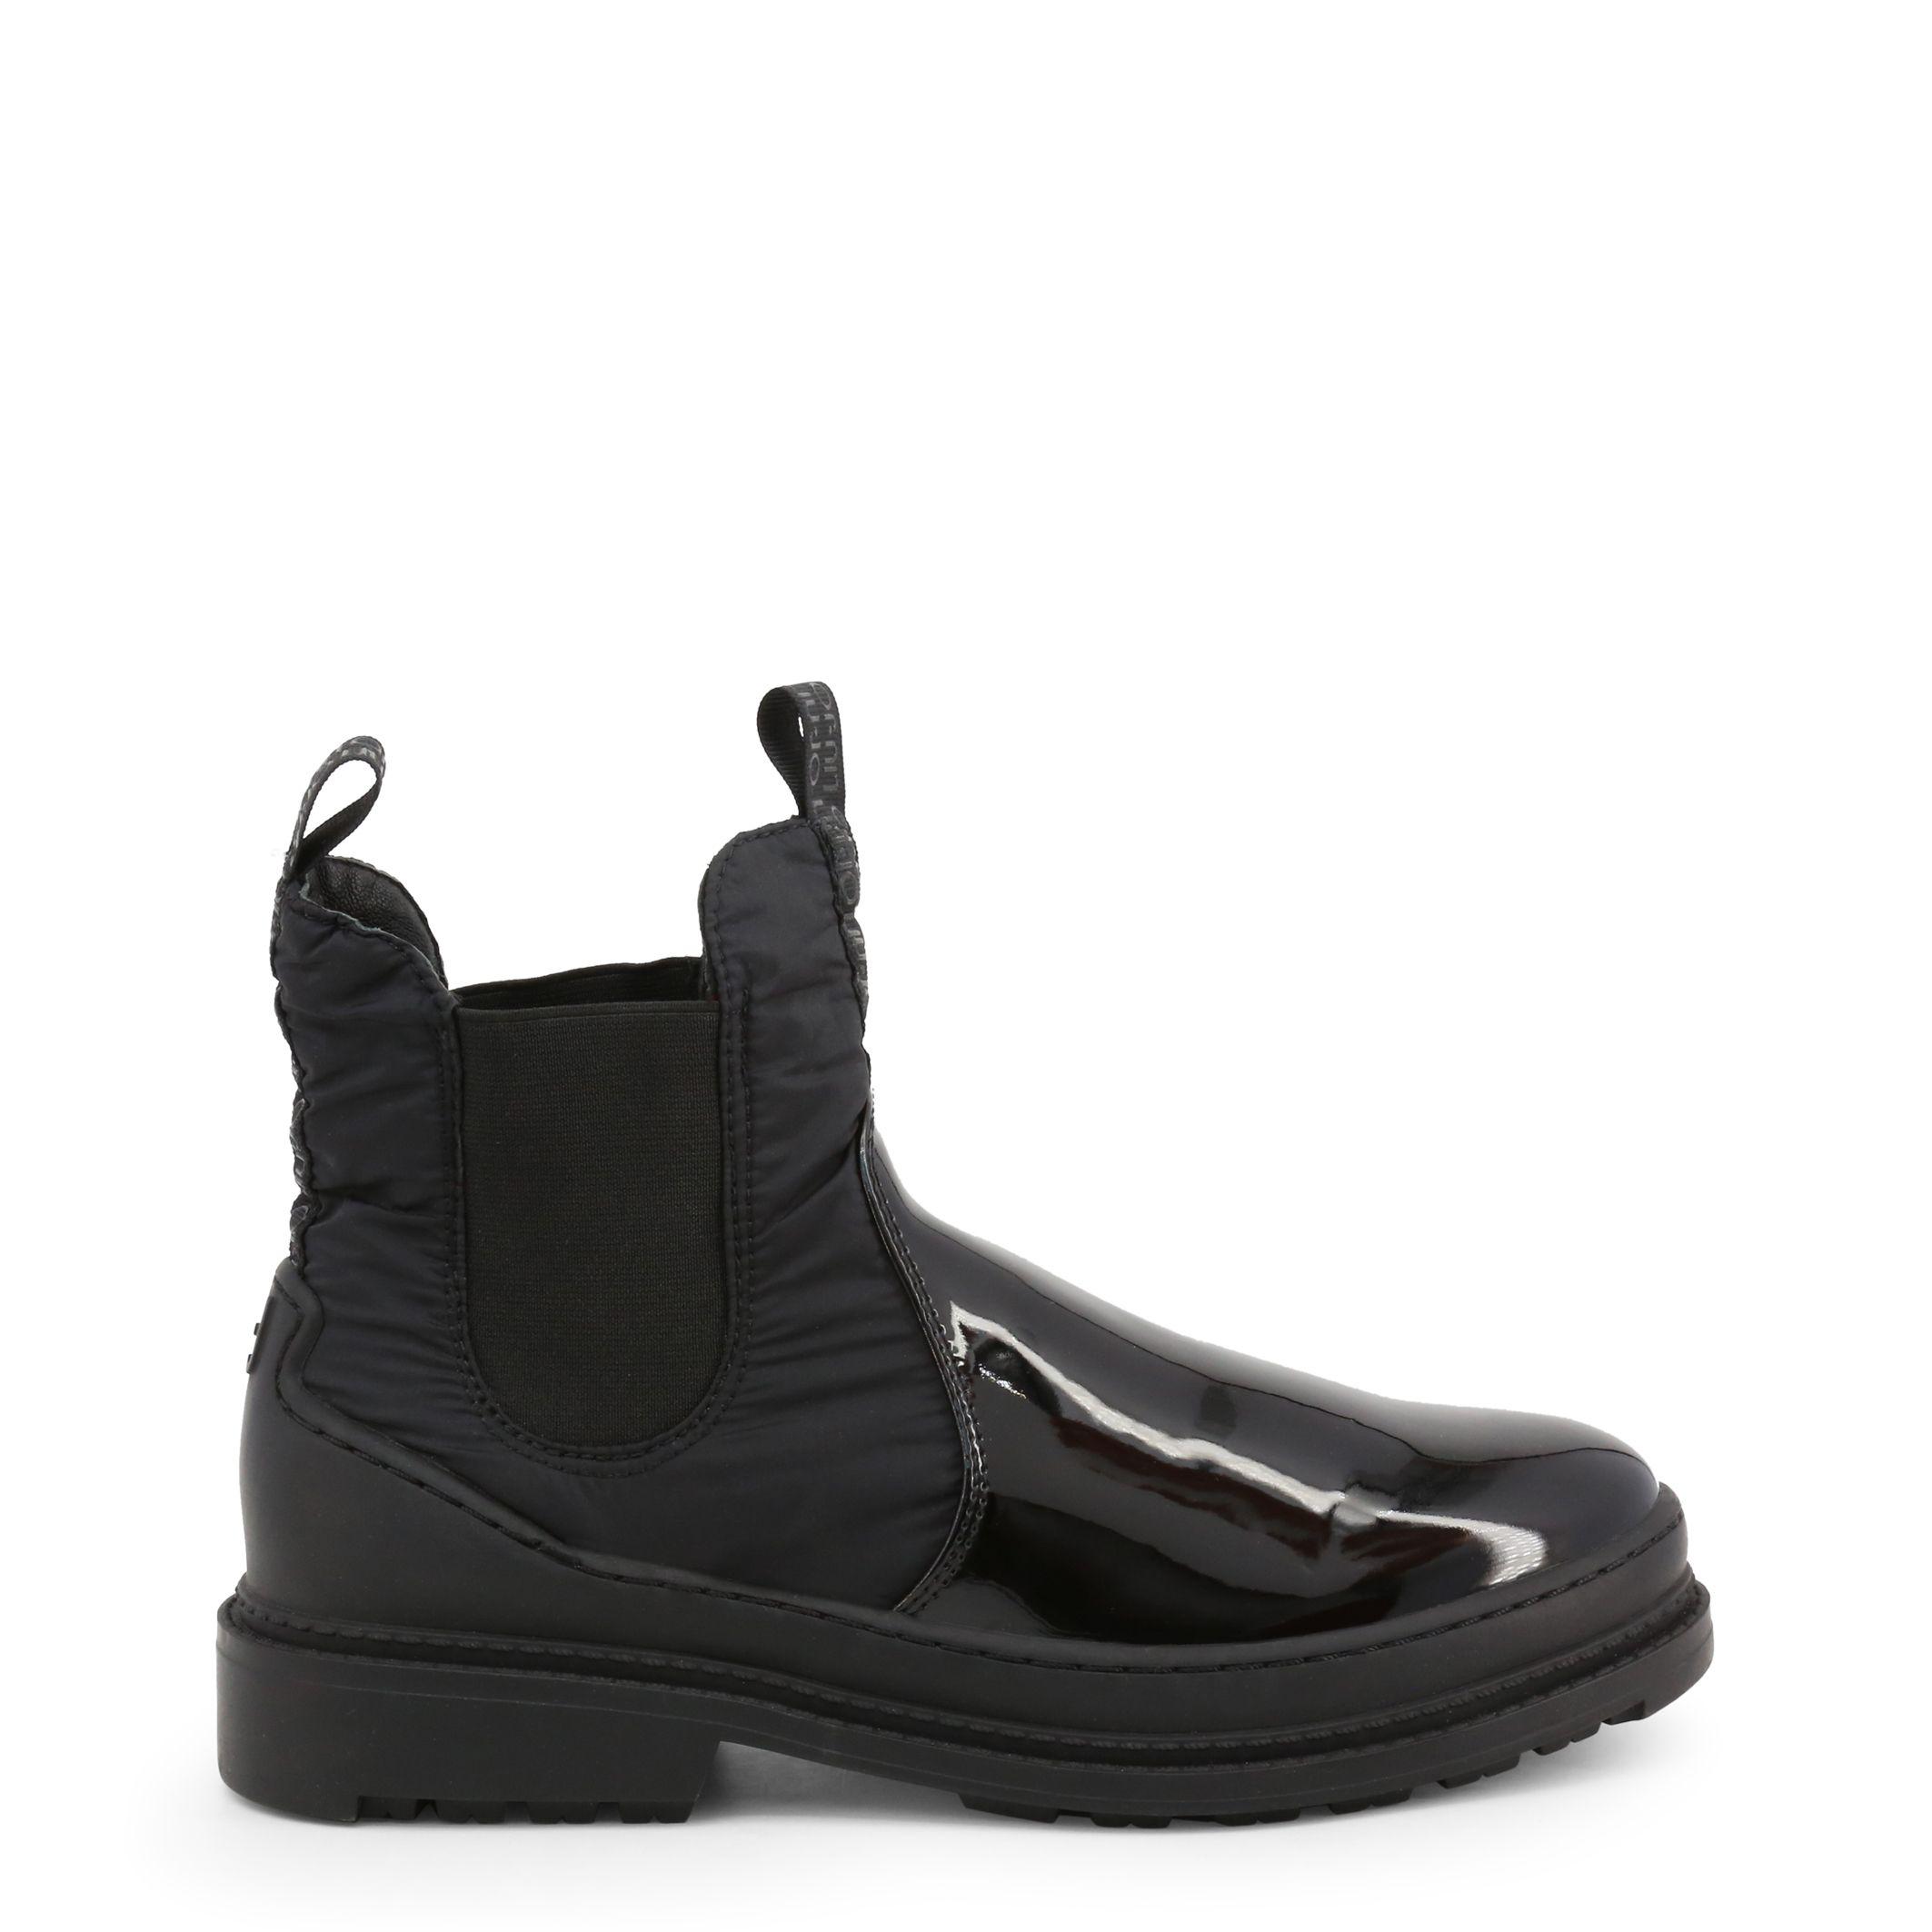 Schuhe Liu Jo – S69027EX010 – Schwarz